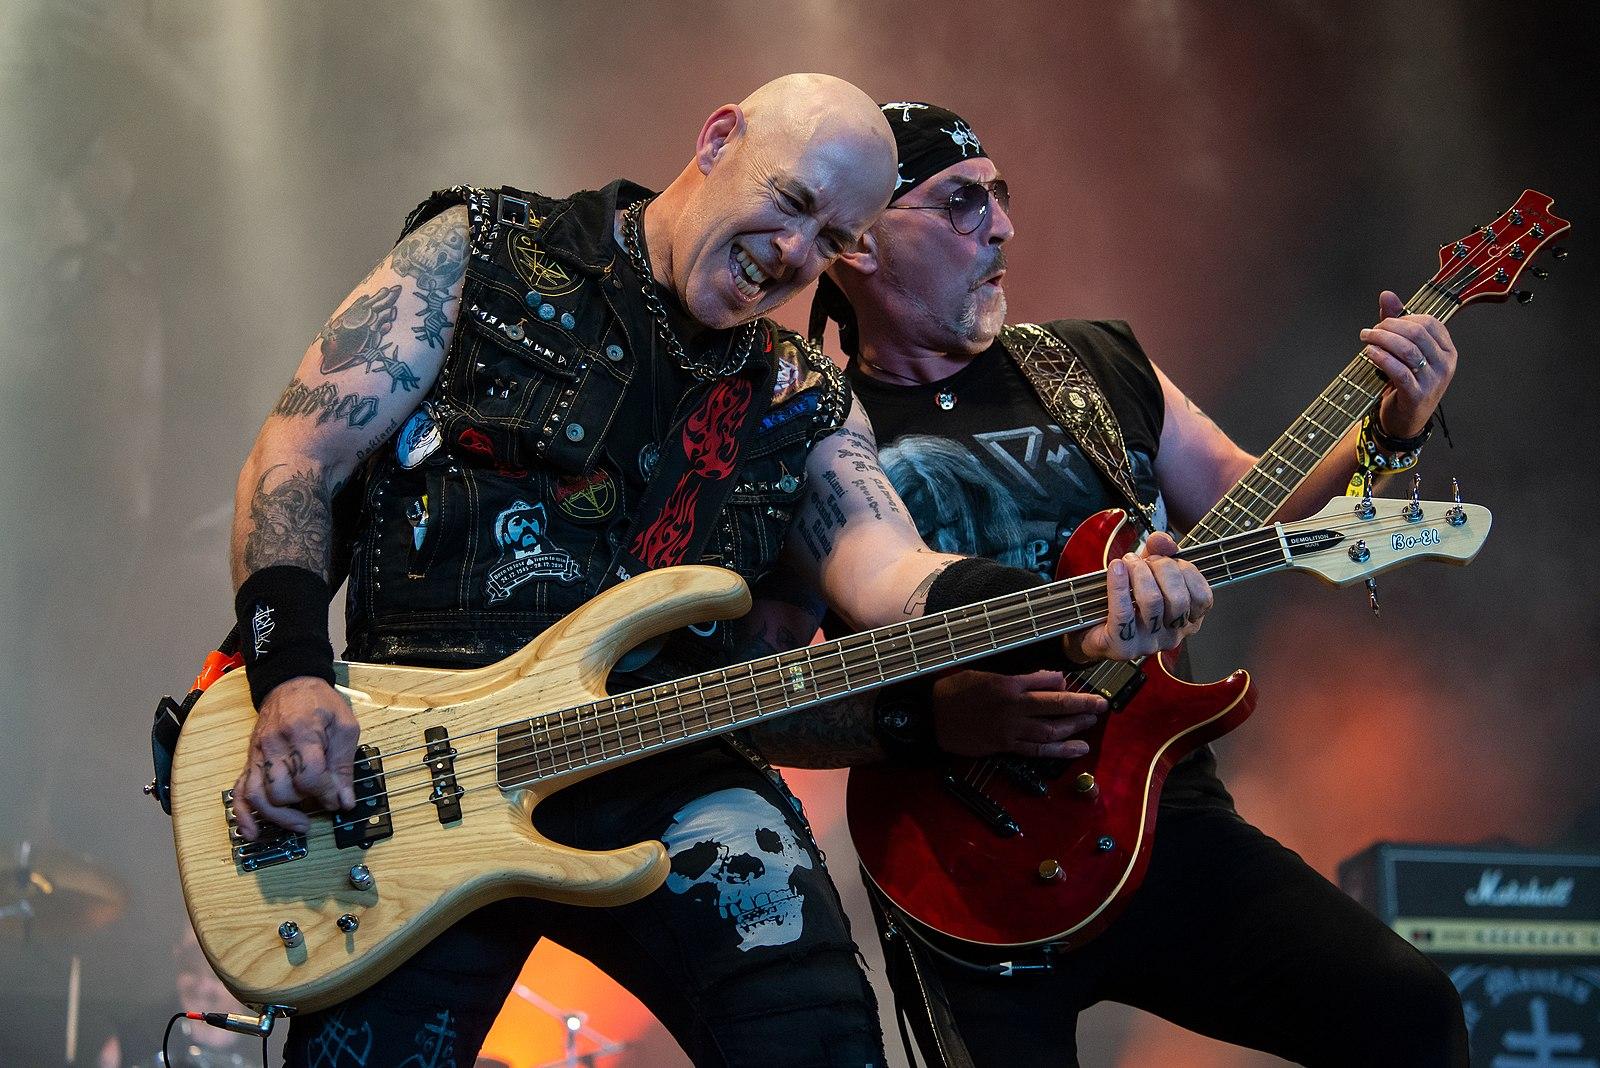 Concert du groupe Venom Inc. au Hellfest 2019.